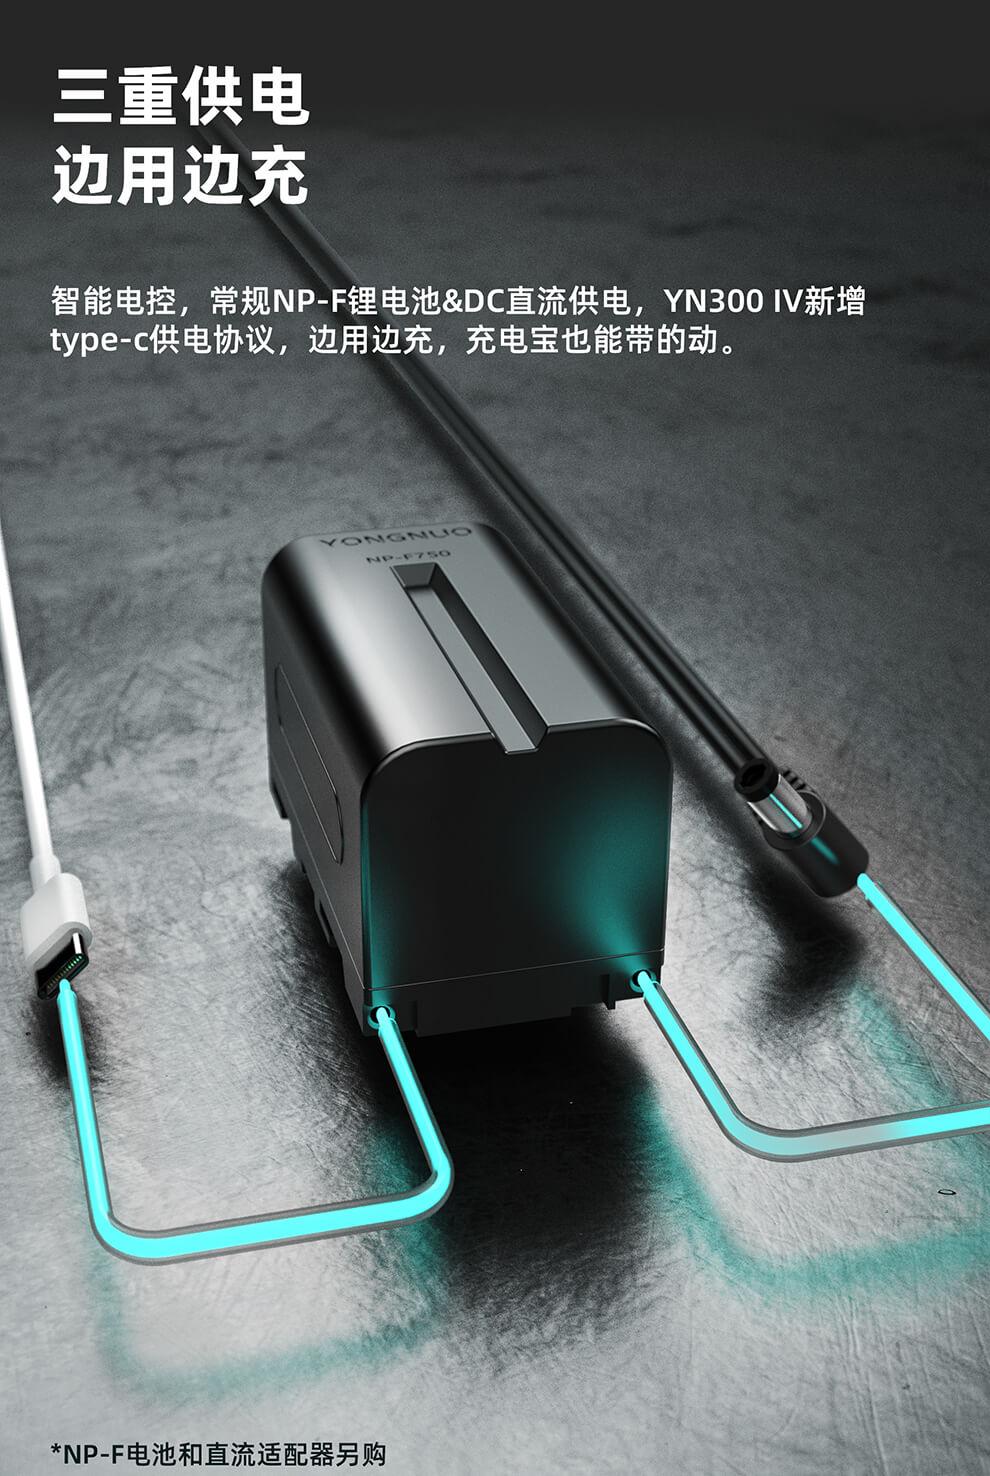 天猫商城客服电话_永诺LED YN300 IV摄像灯-Shenzhen Yongnuo Photographic Equipment Co., Ltd.